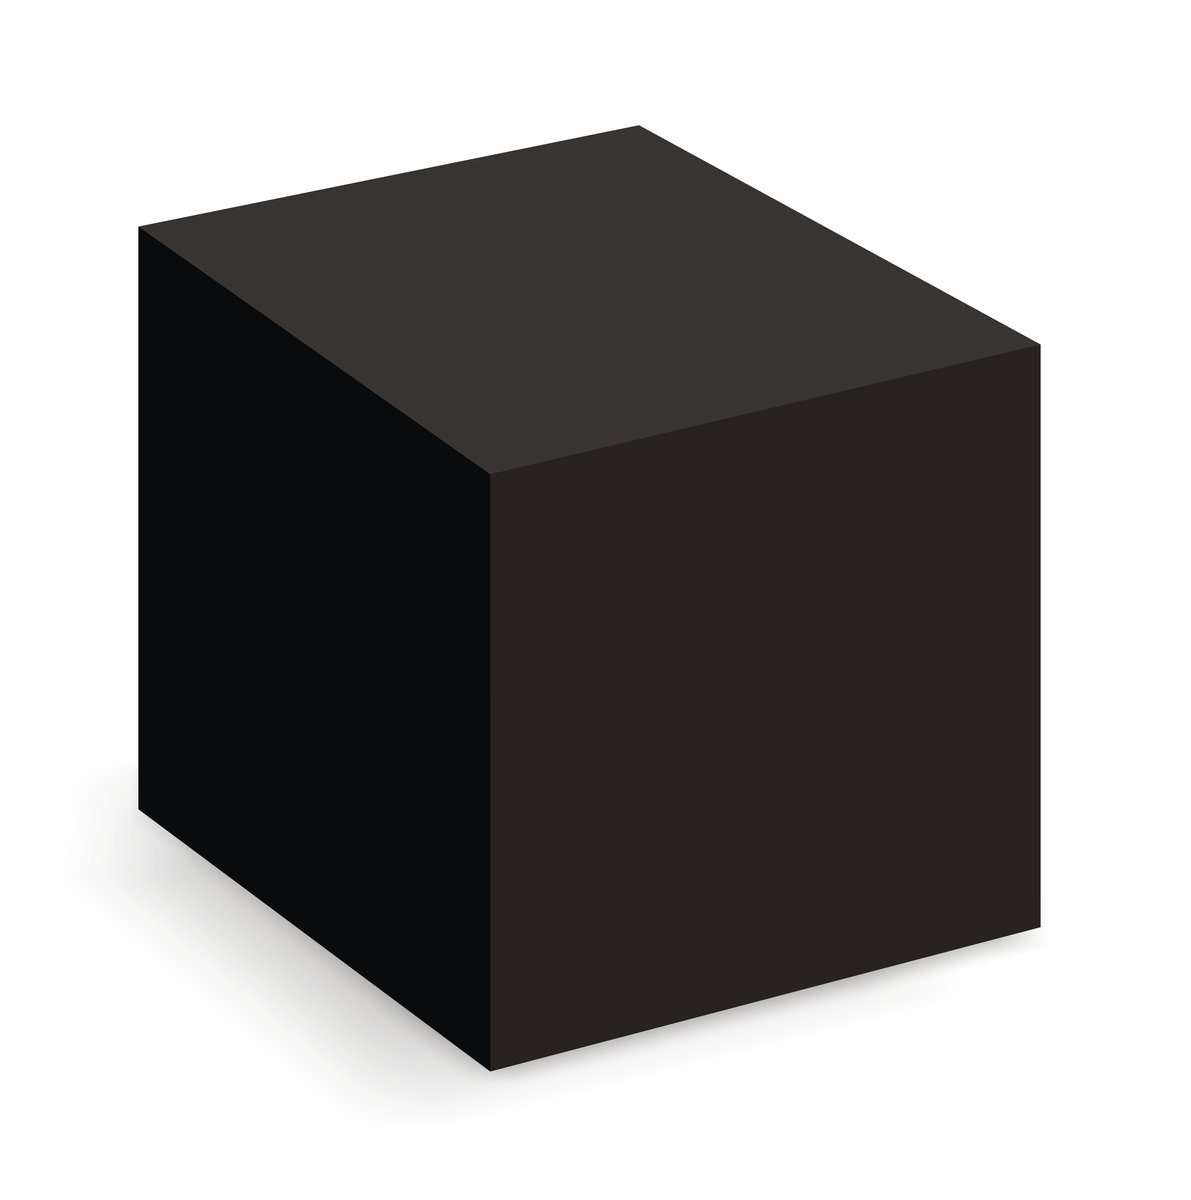 black-box-pictures-peru-blowjob